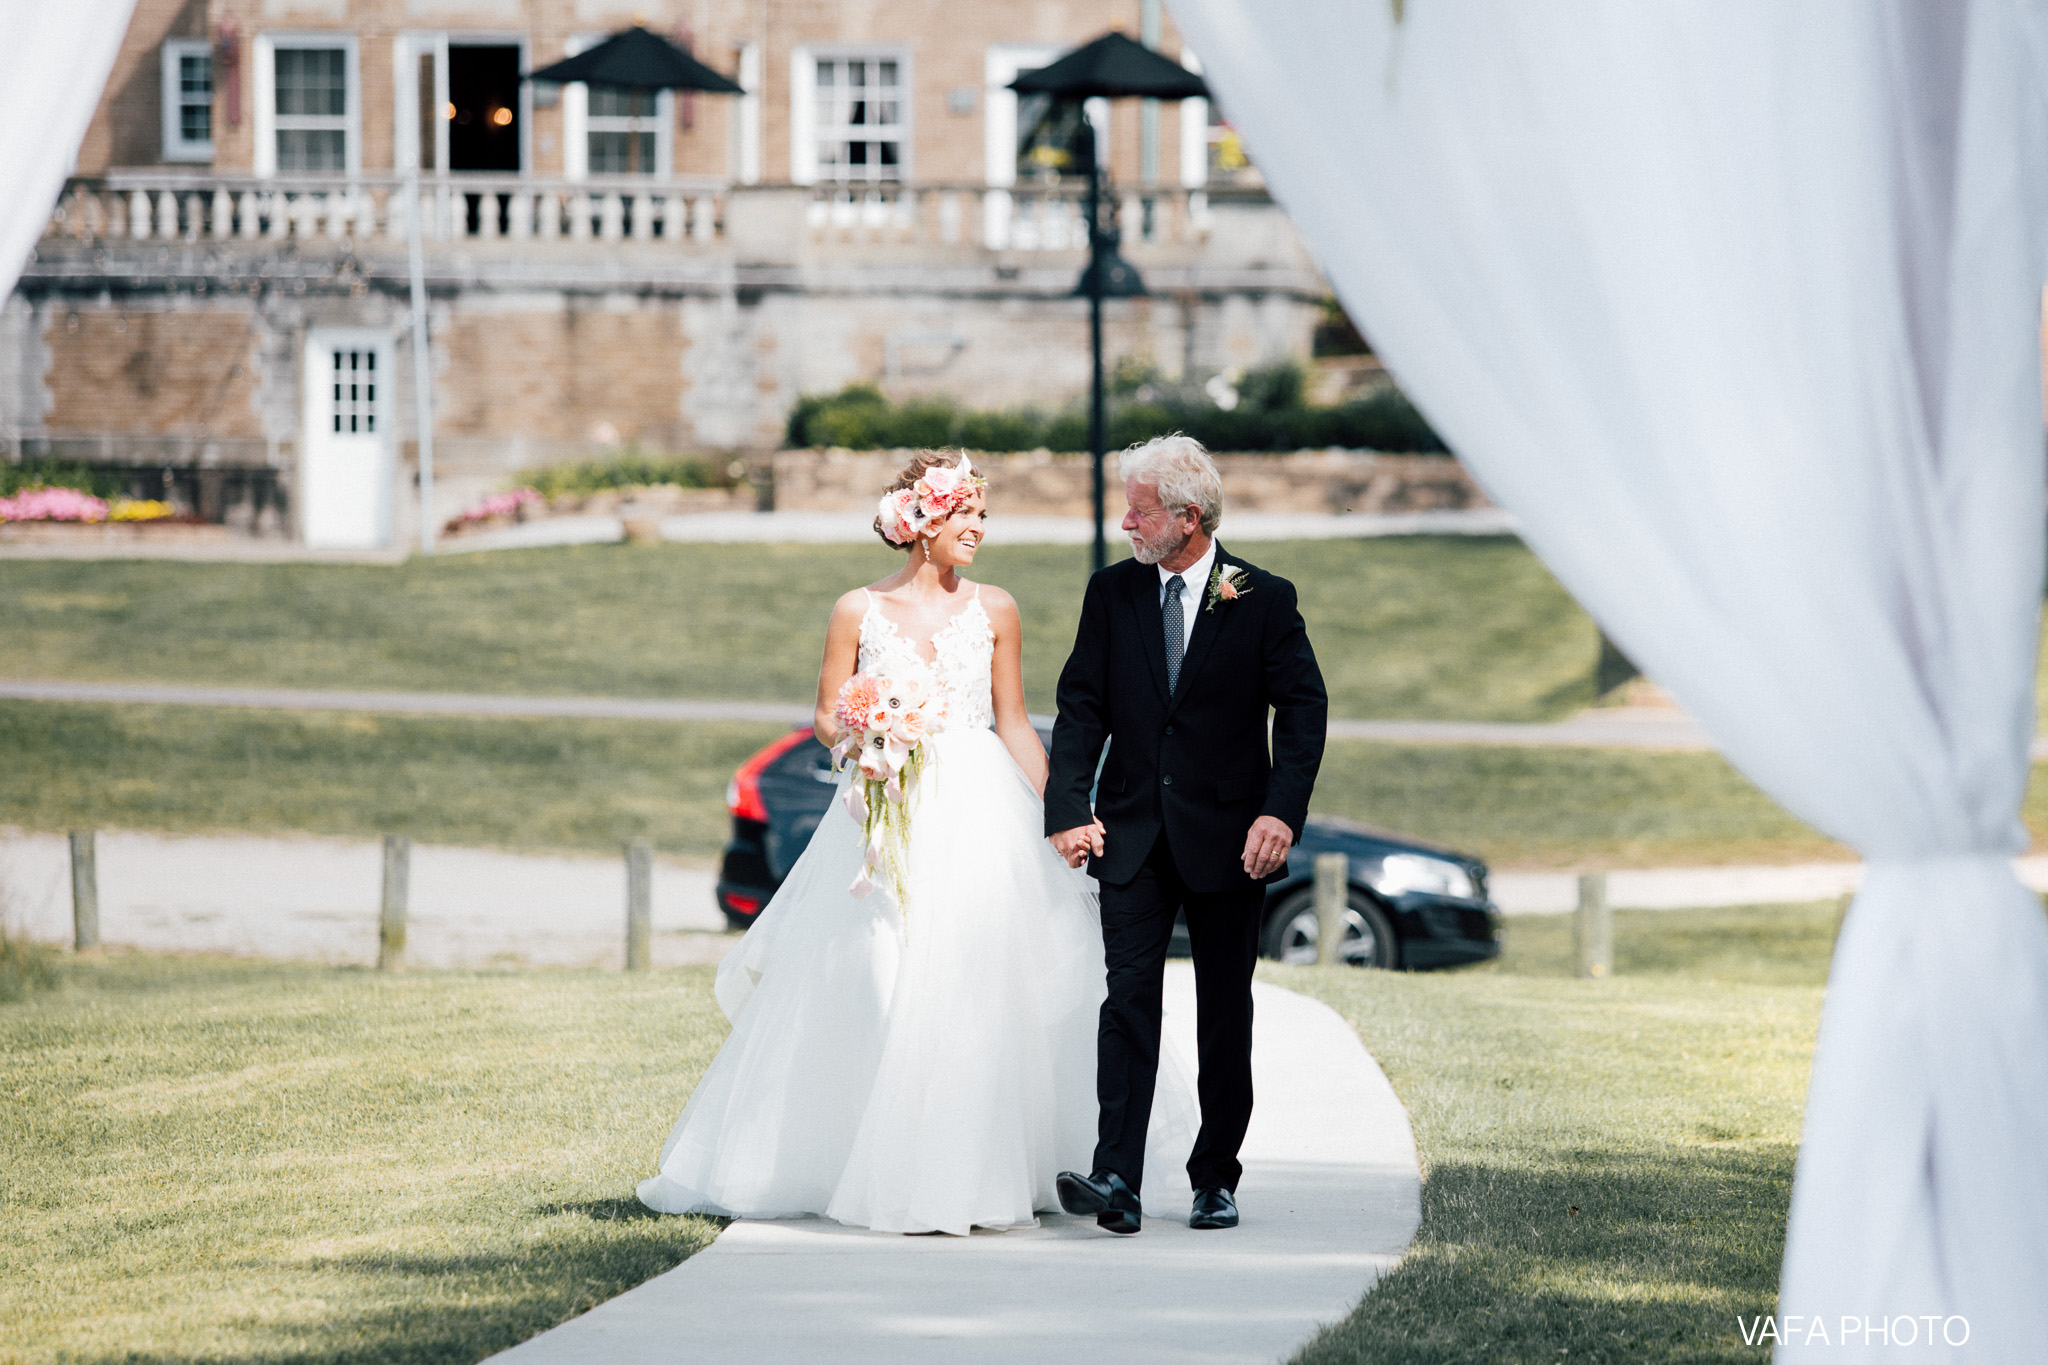 The-Felt-Estate-Wedding-Kailie-David-Vafa-Photo-290.jpg